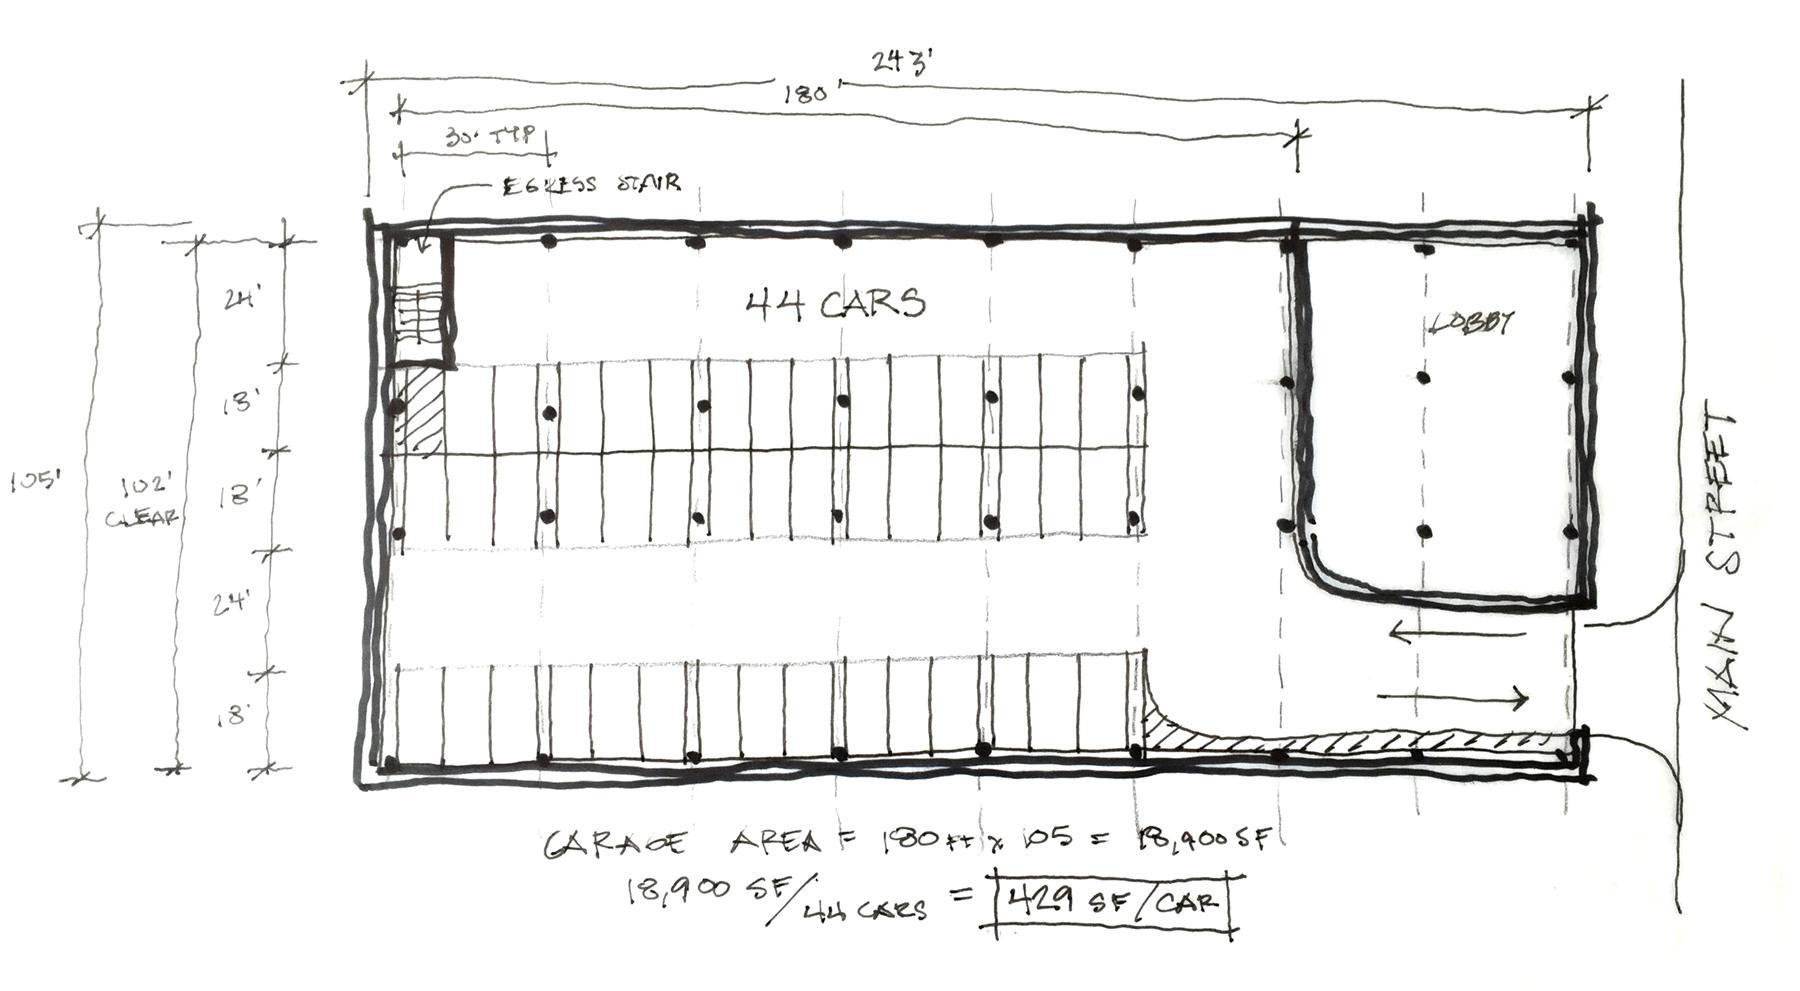 windo chevy tracker wiring diagram